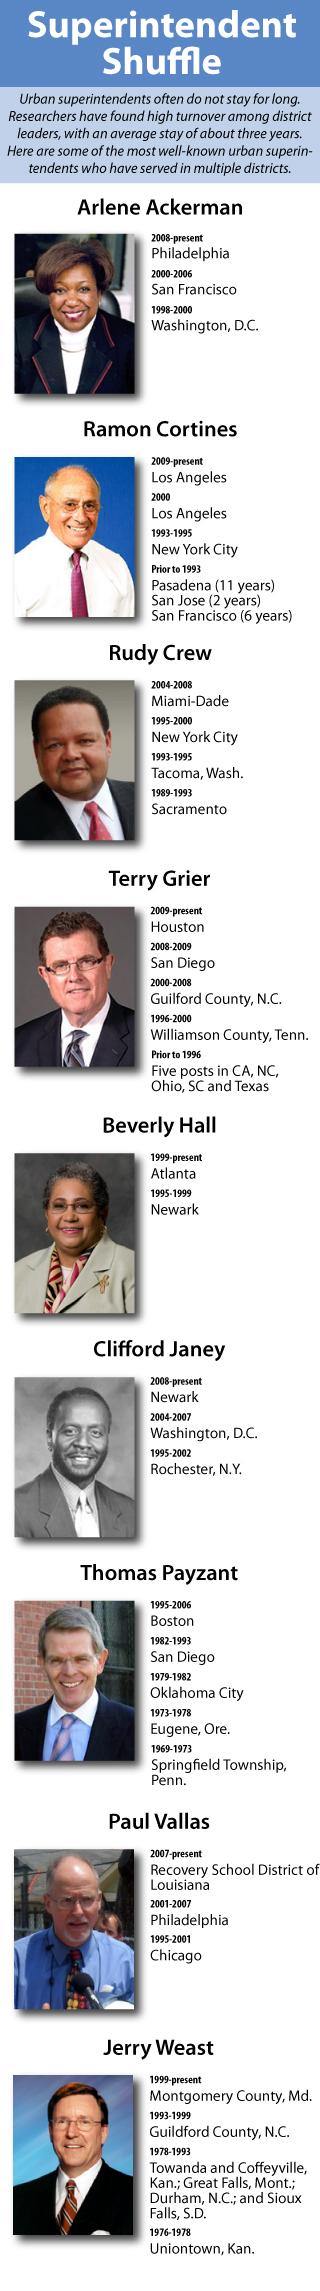 2010-11-11-superintendentshuffle.jpg